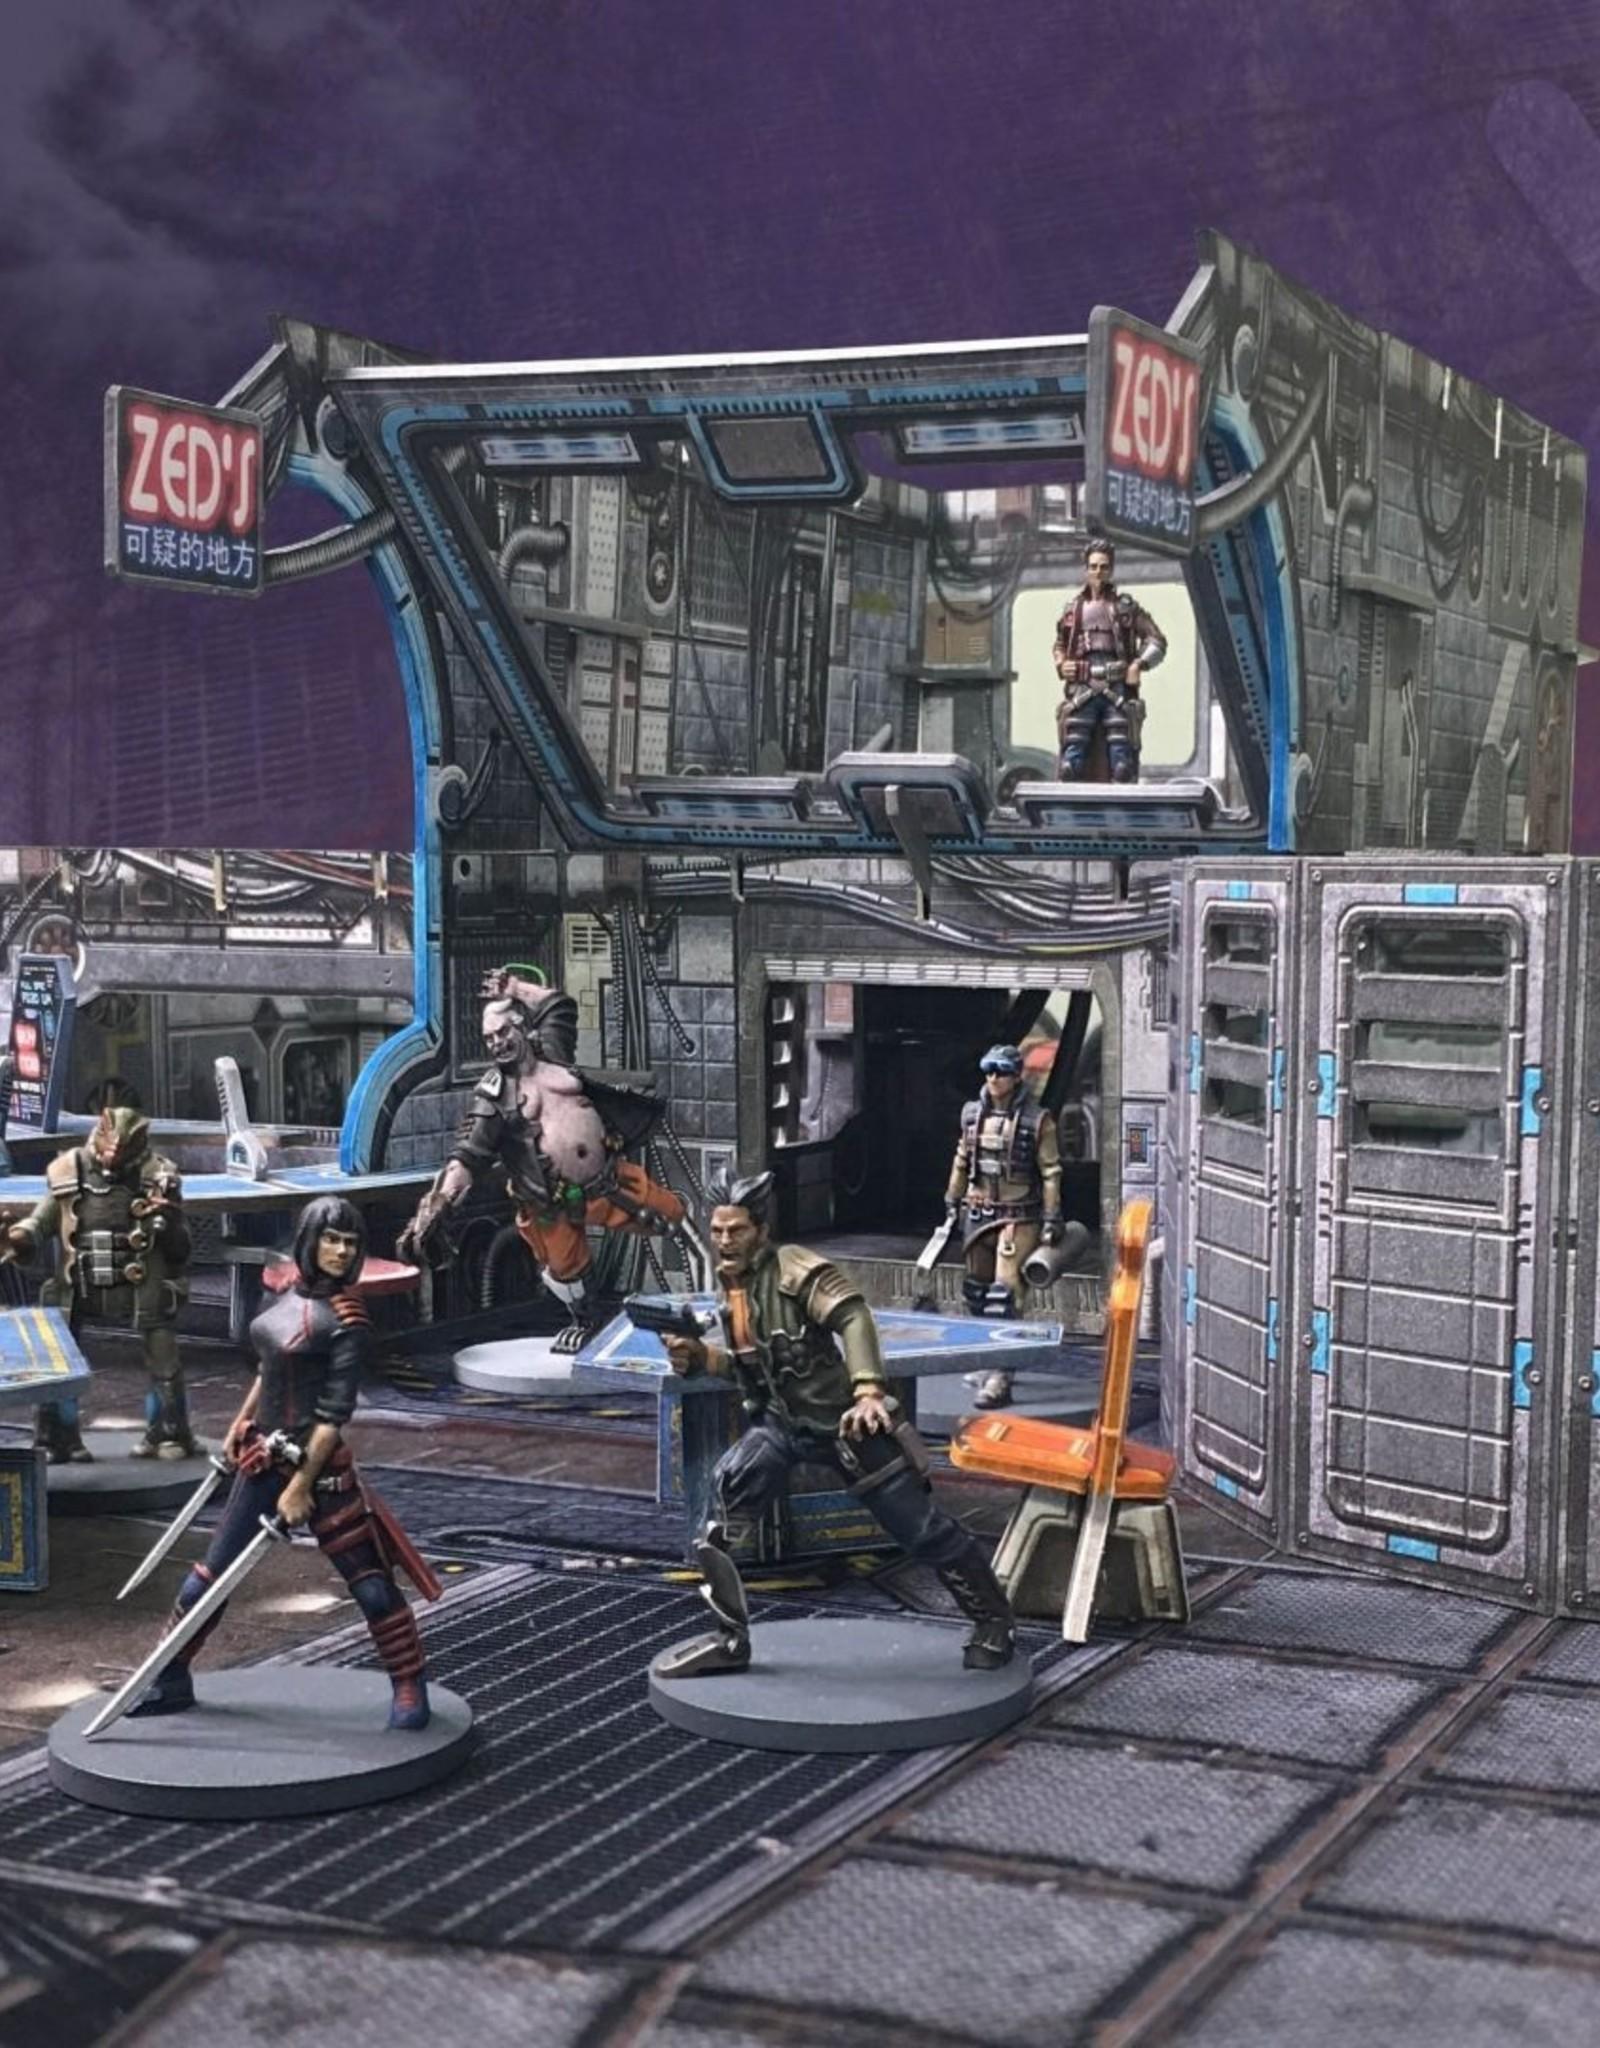 Battle Systems Core Space Shootout at Zed's Expansion